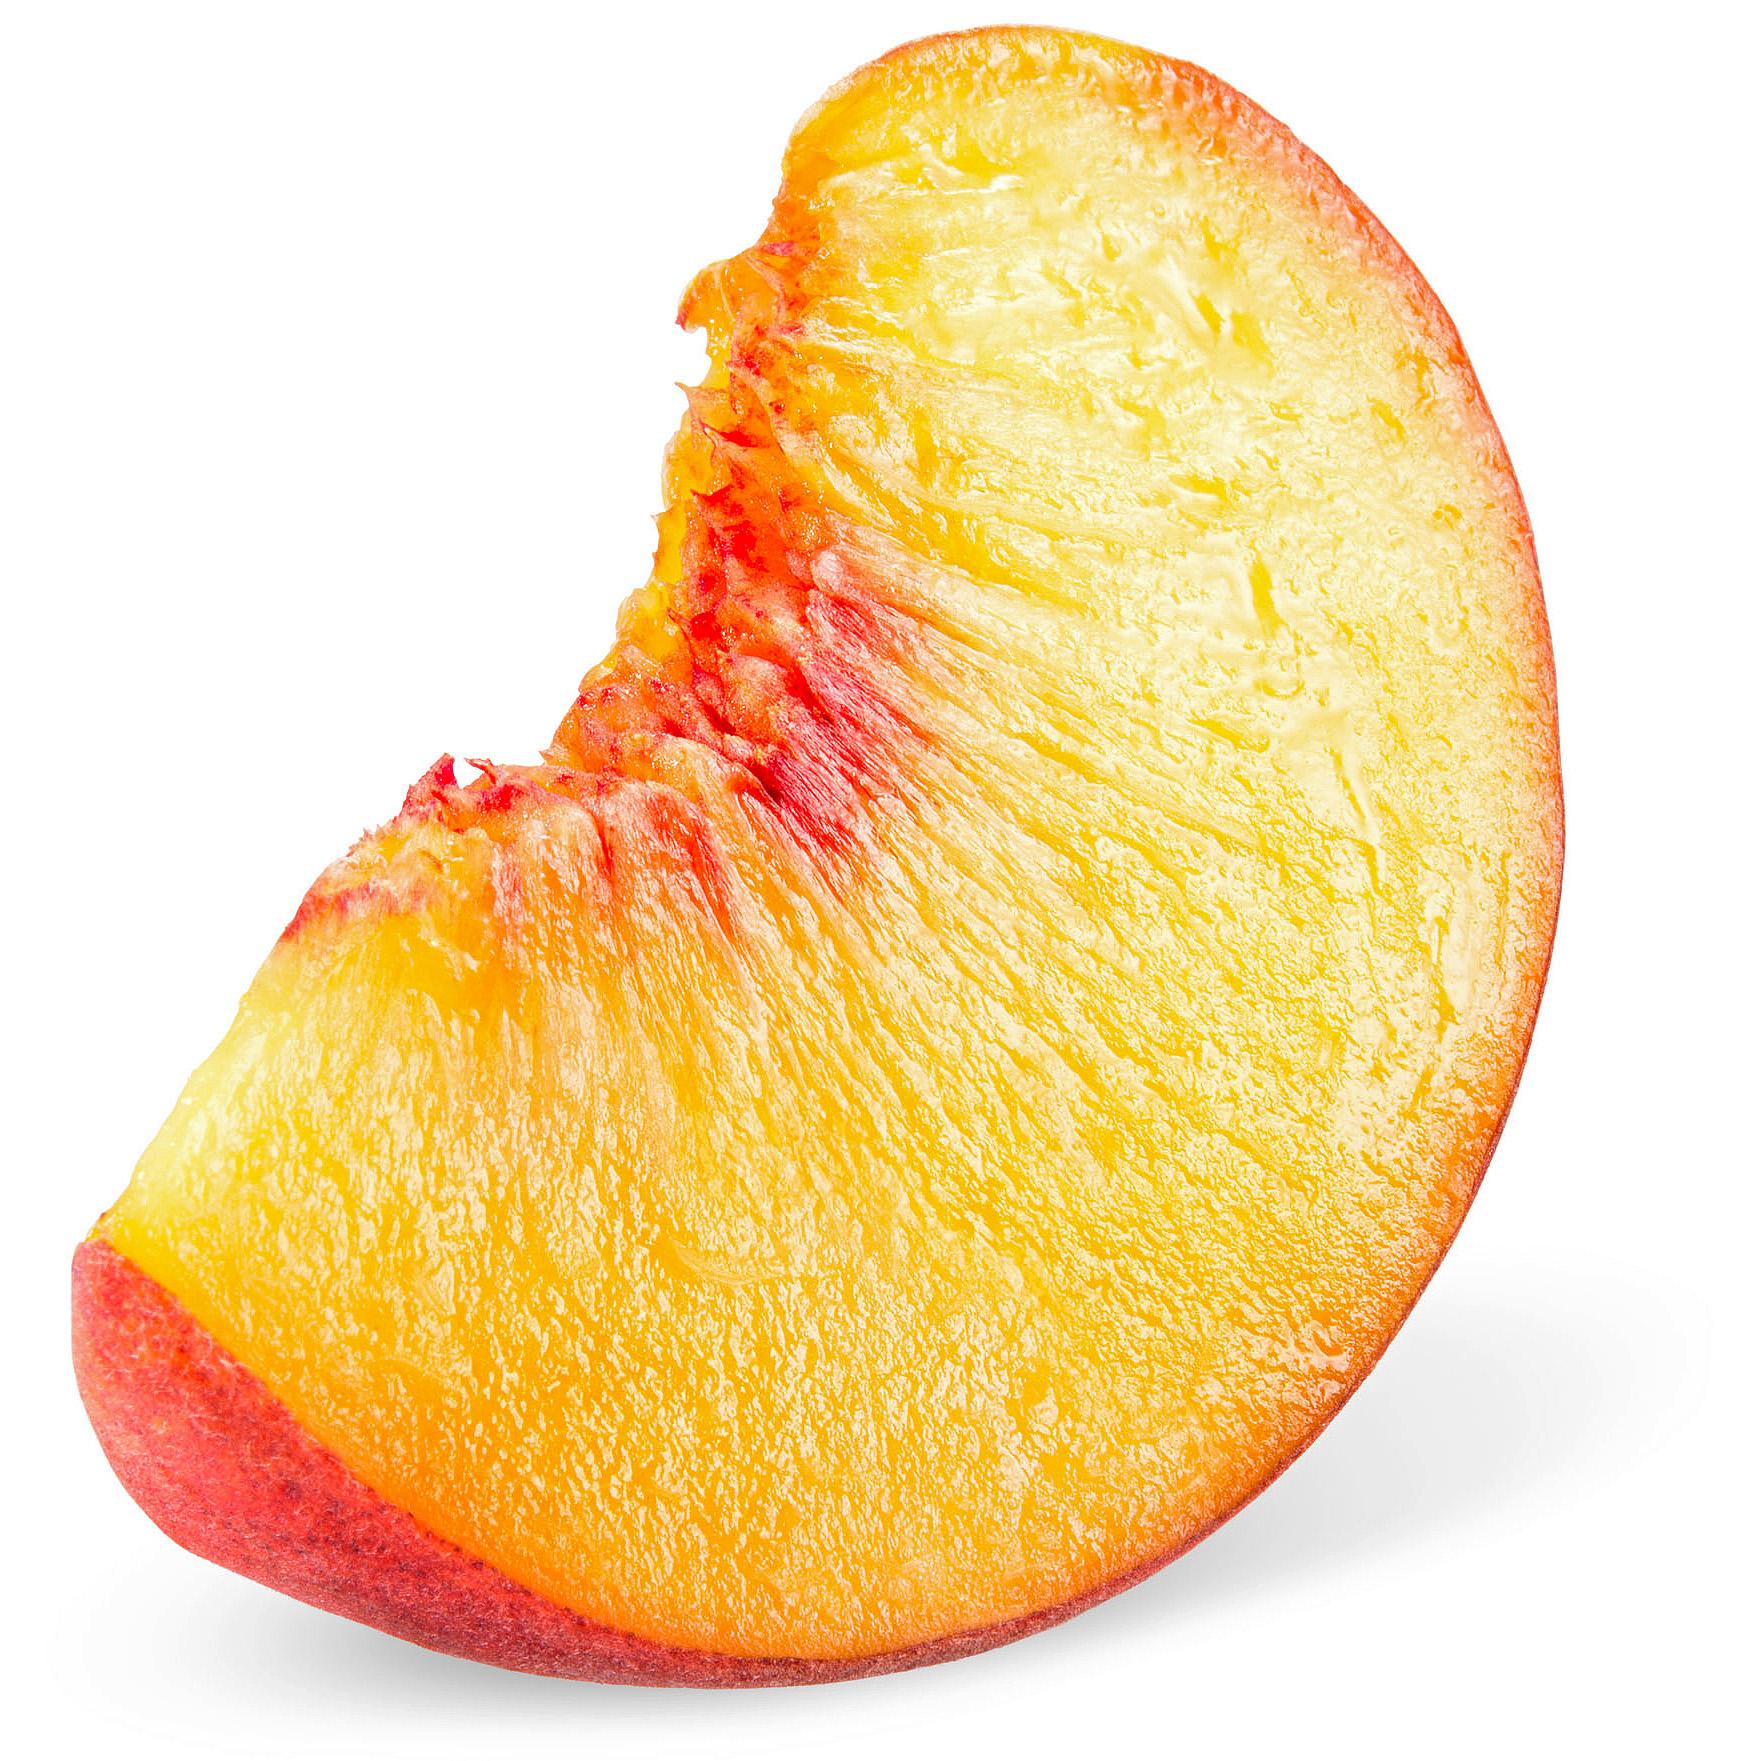 detail of peach slice